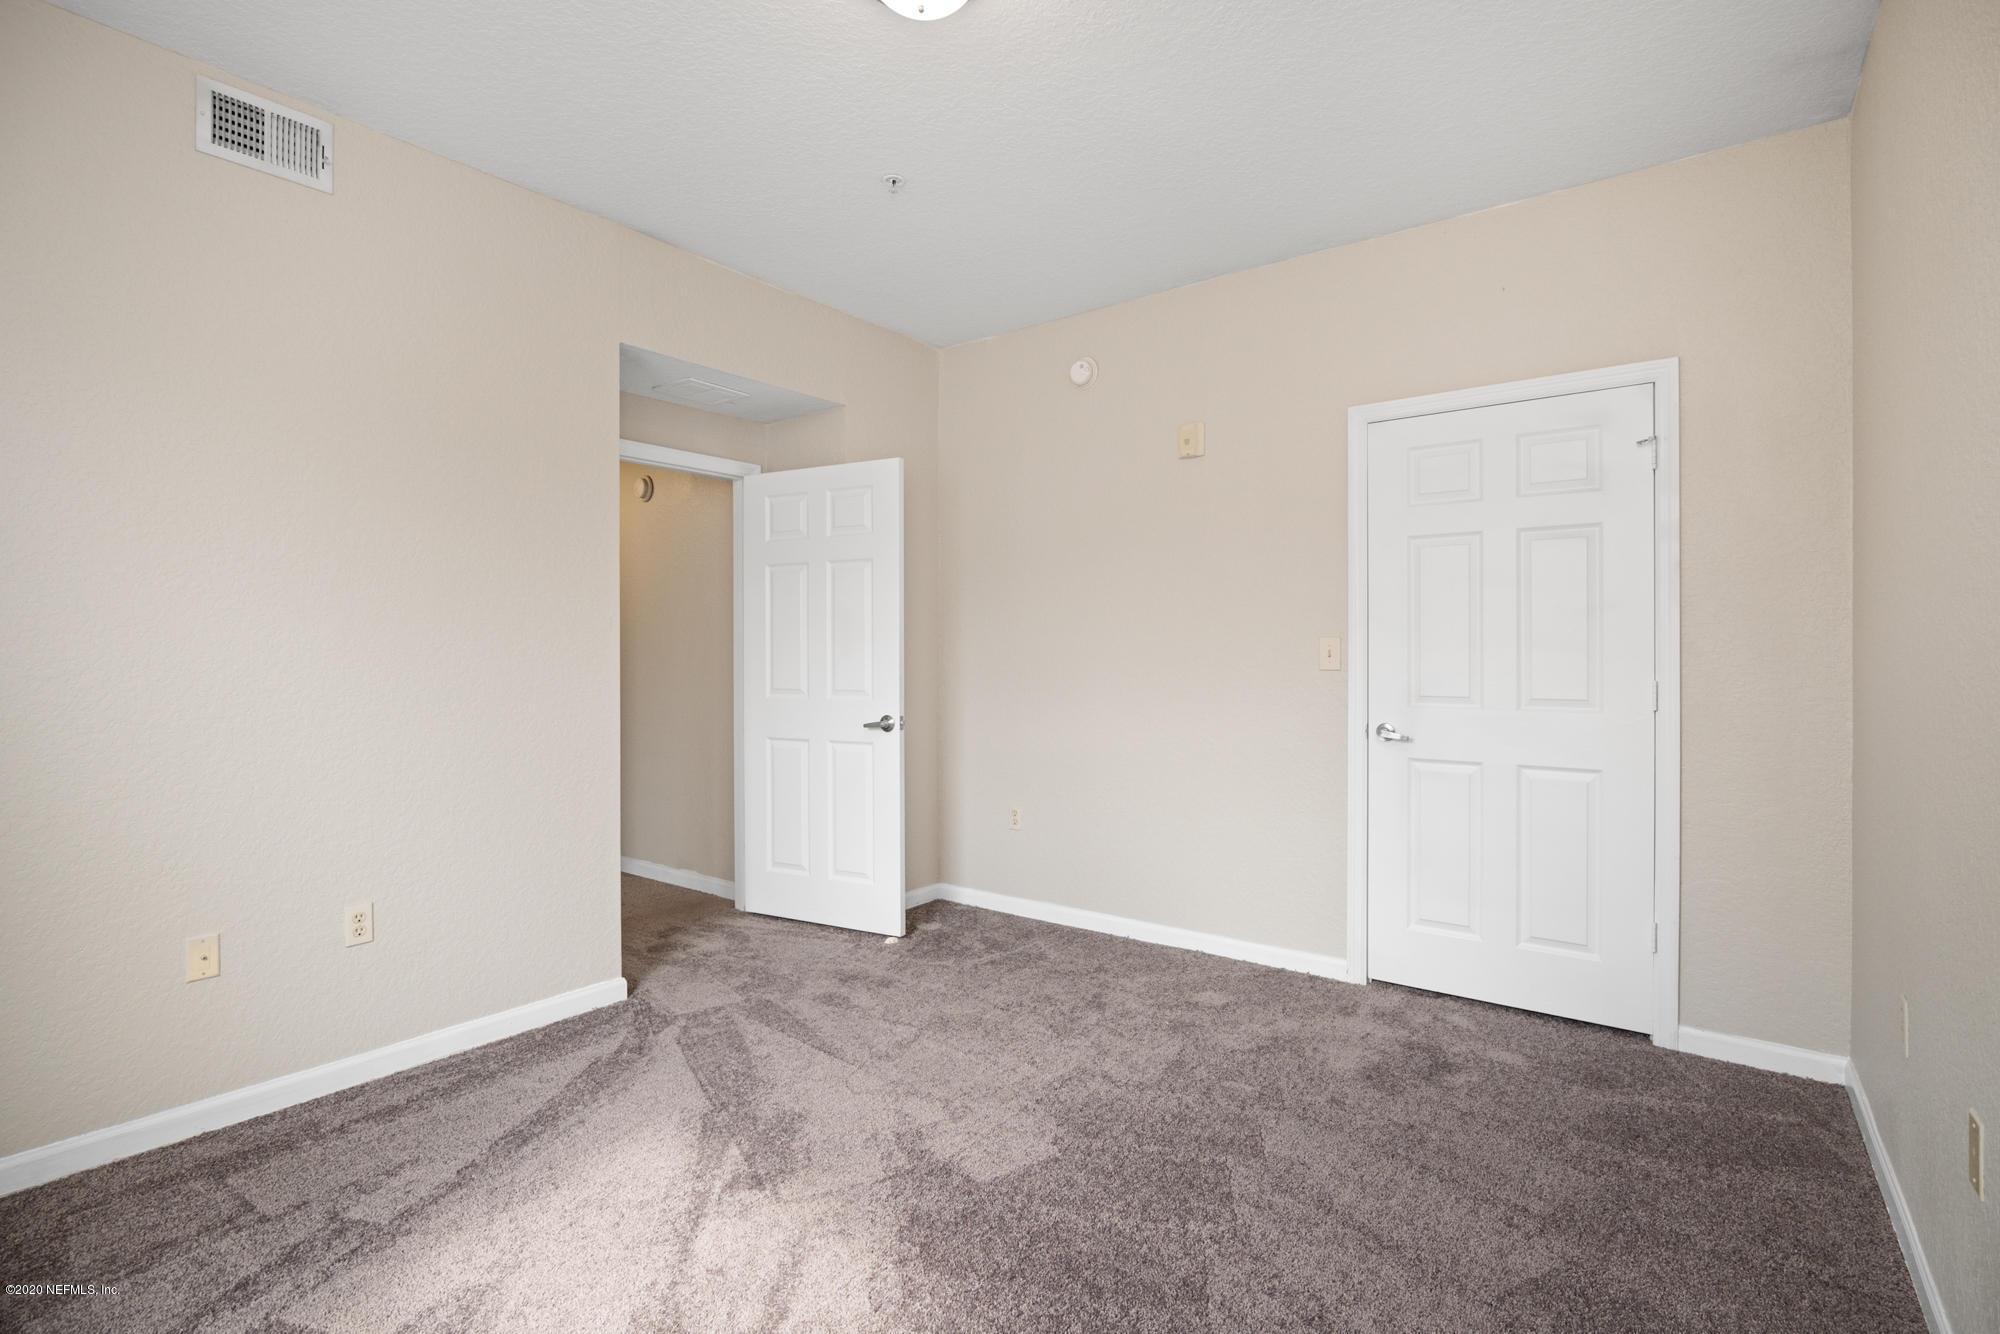 8539 GATE, JACKSONVILLE, FLORIDA 32216, 3 Bedrooms Bedrooms, ,2 BathroomsBathrooms,Residential,For sale,GATE,1079782